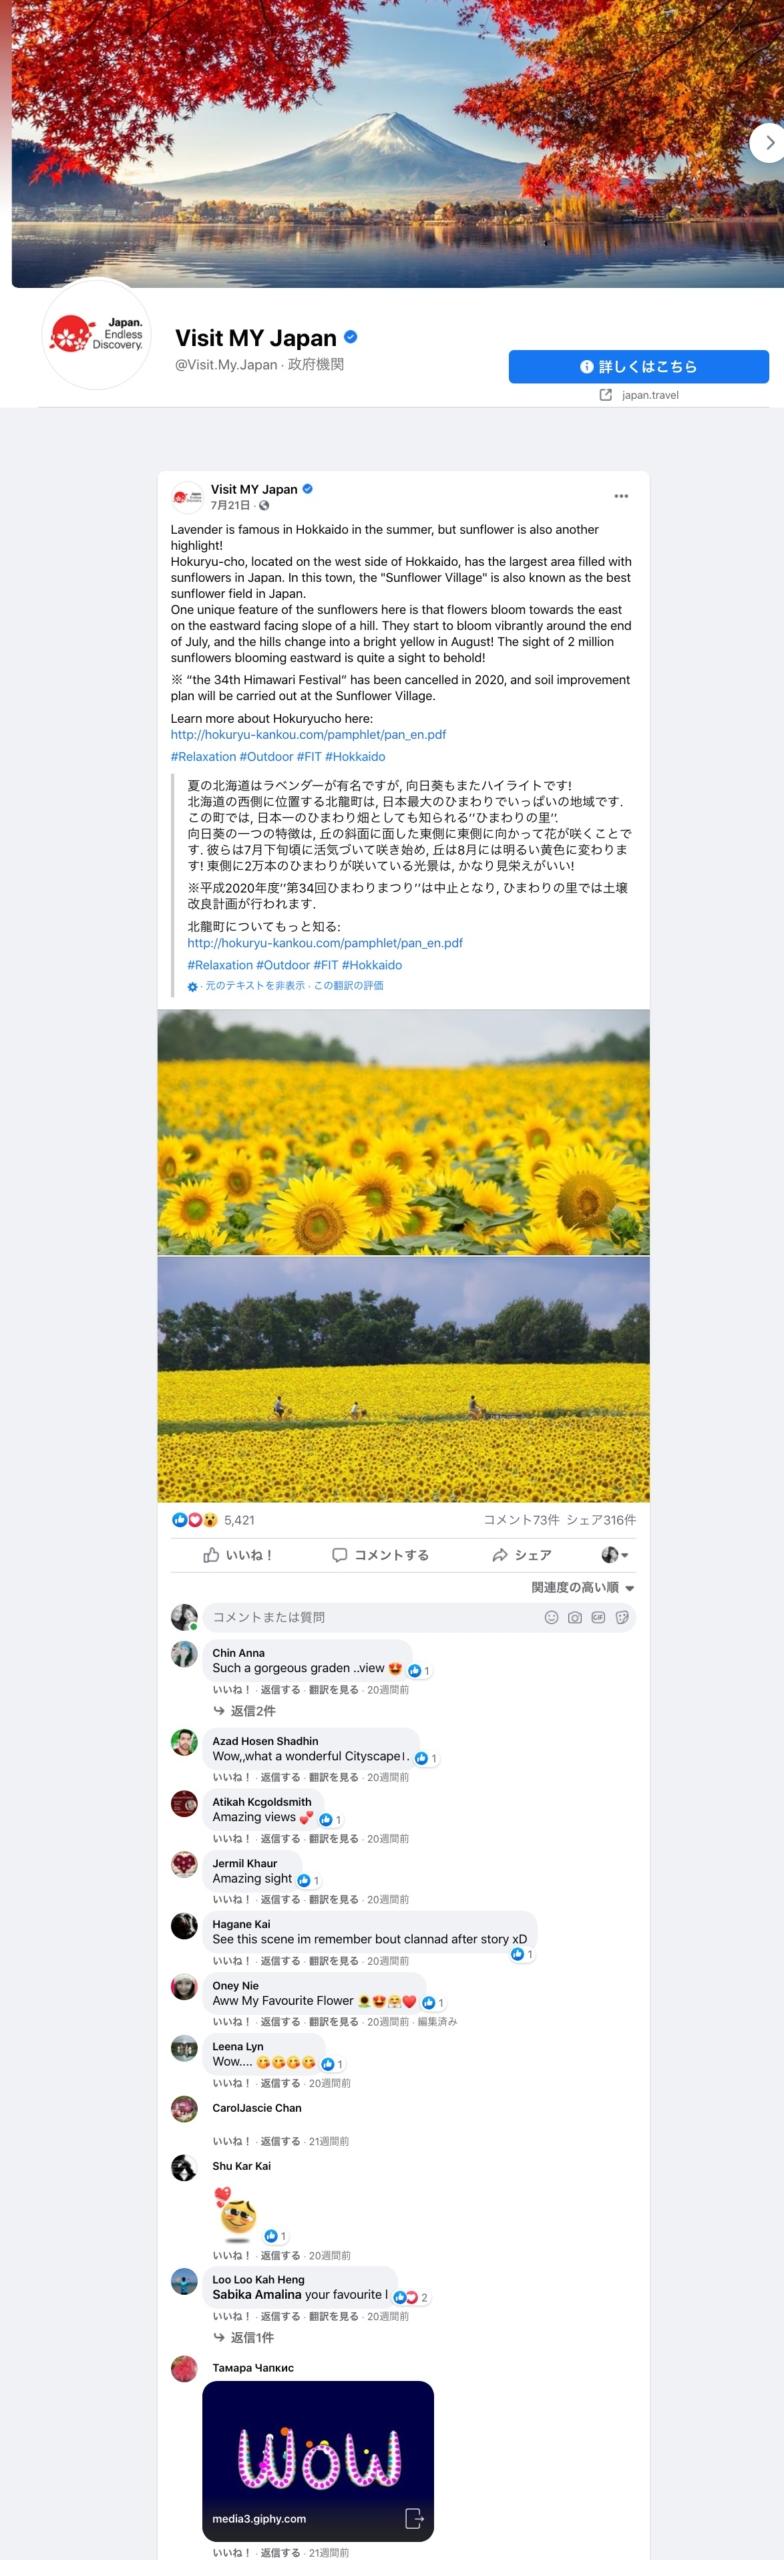 Facebookページ『Visit MY Japan』